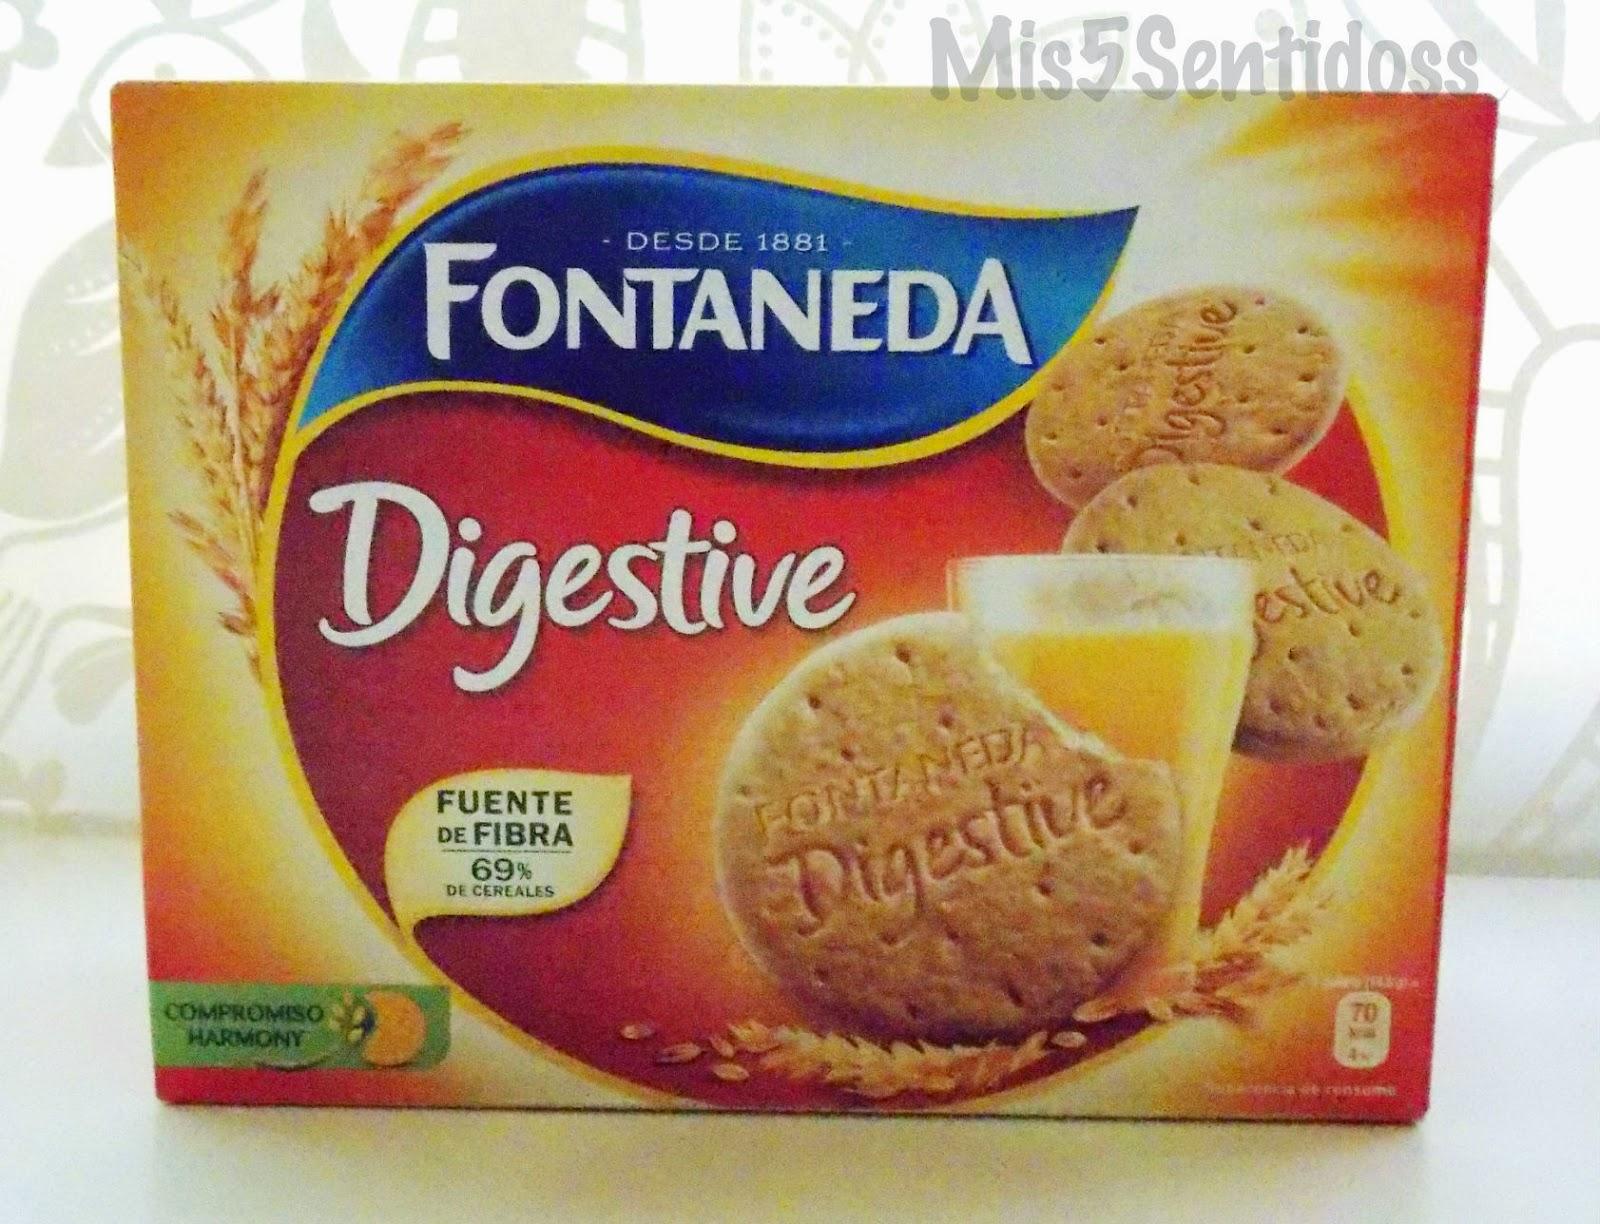 Degustabox agosto 2014 Fontaneda Digestive